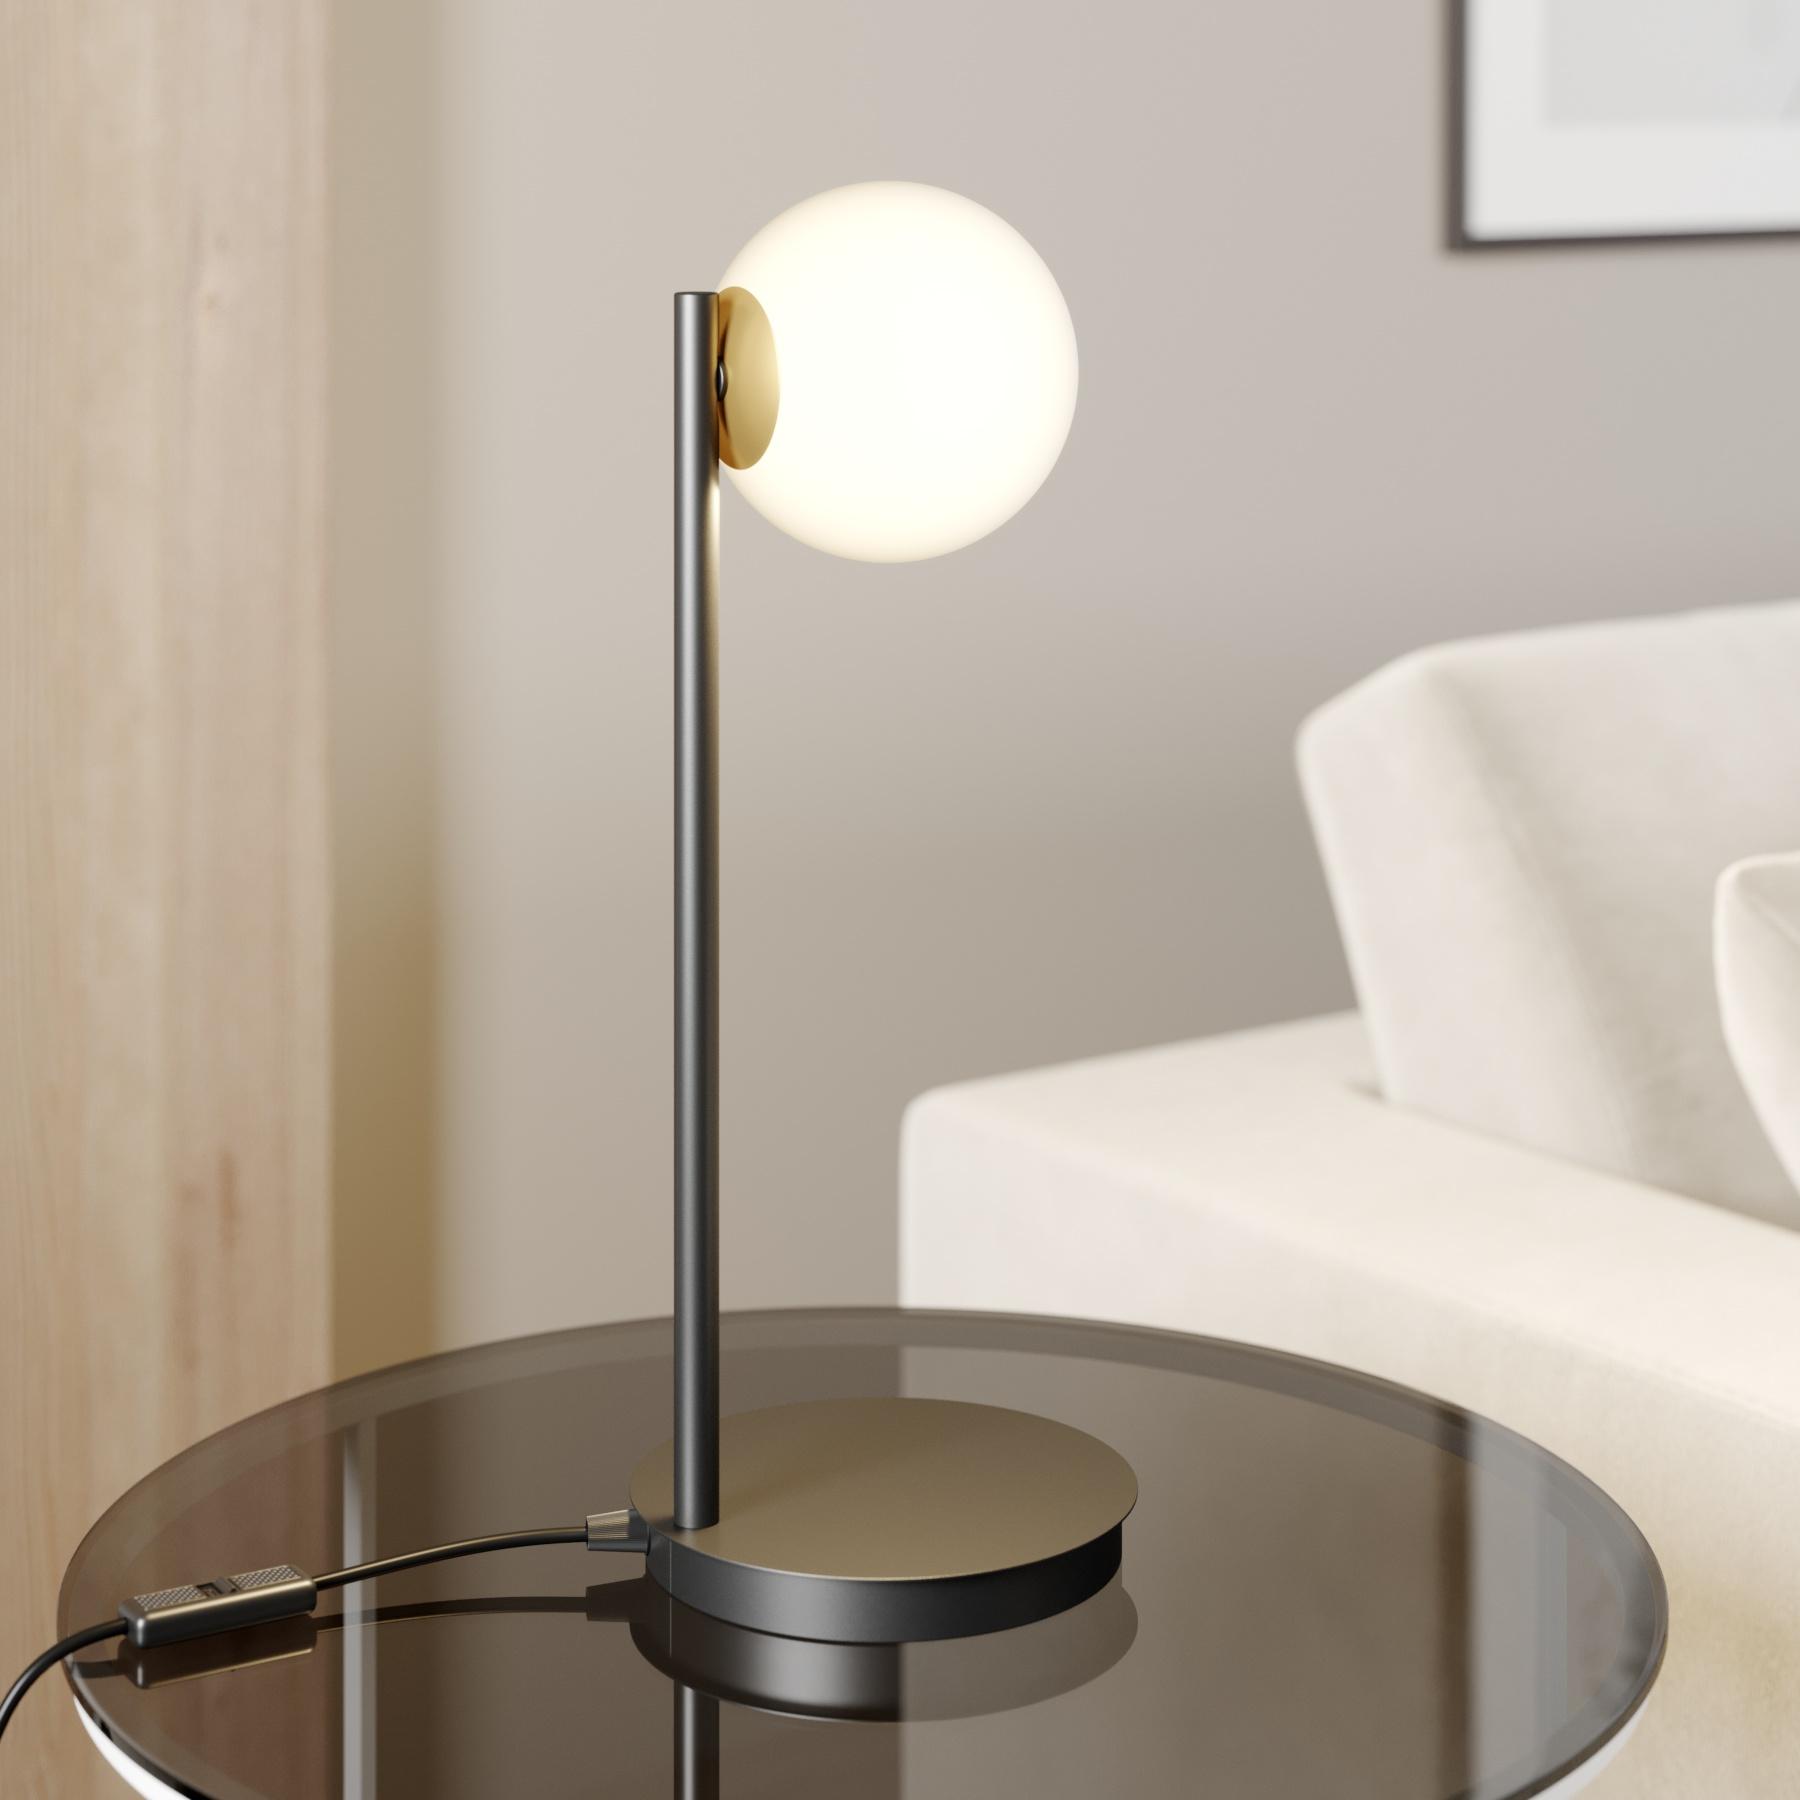 Tafellamp Gama in zwart met glasbol